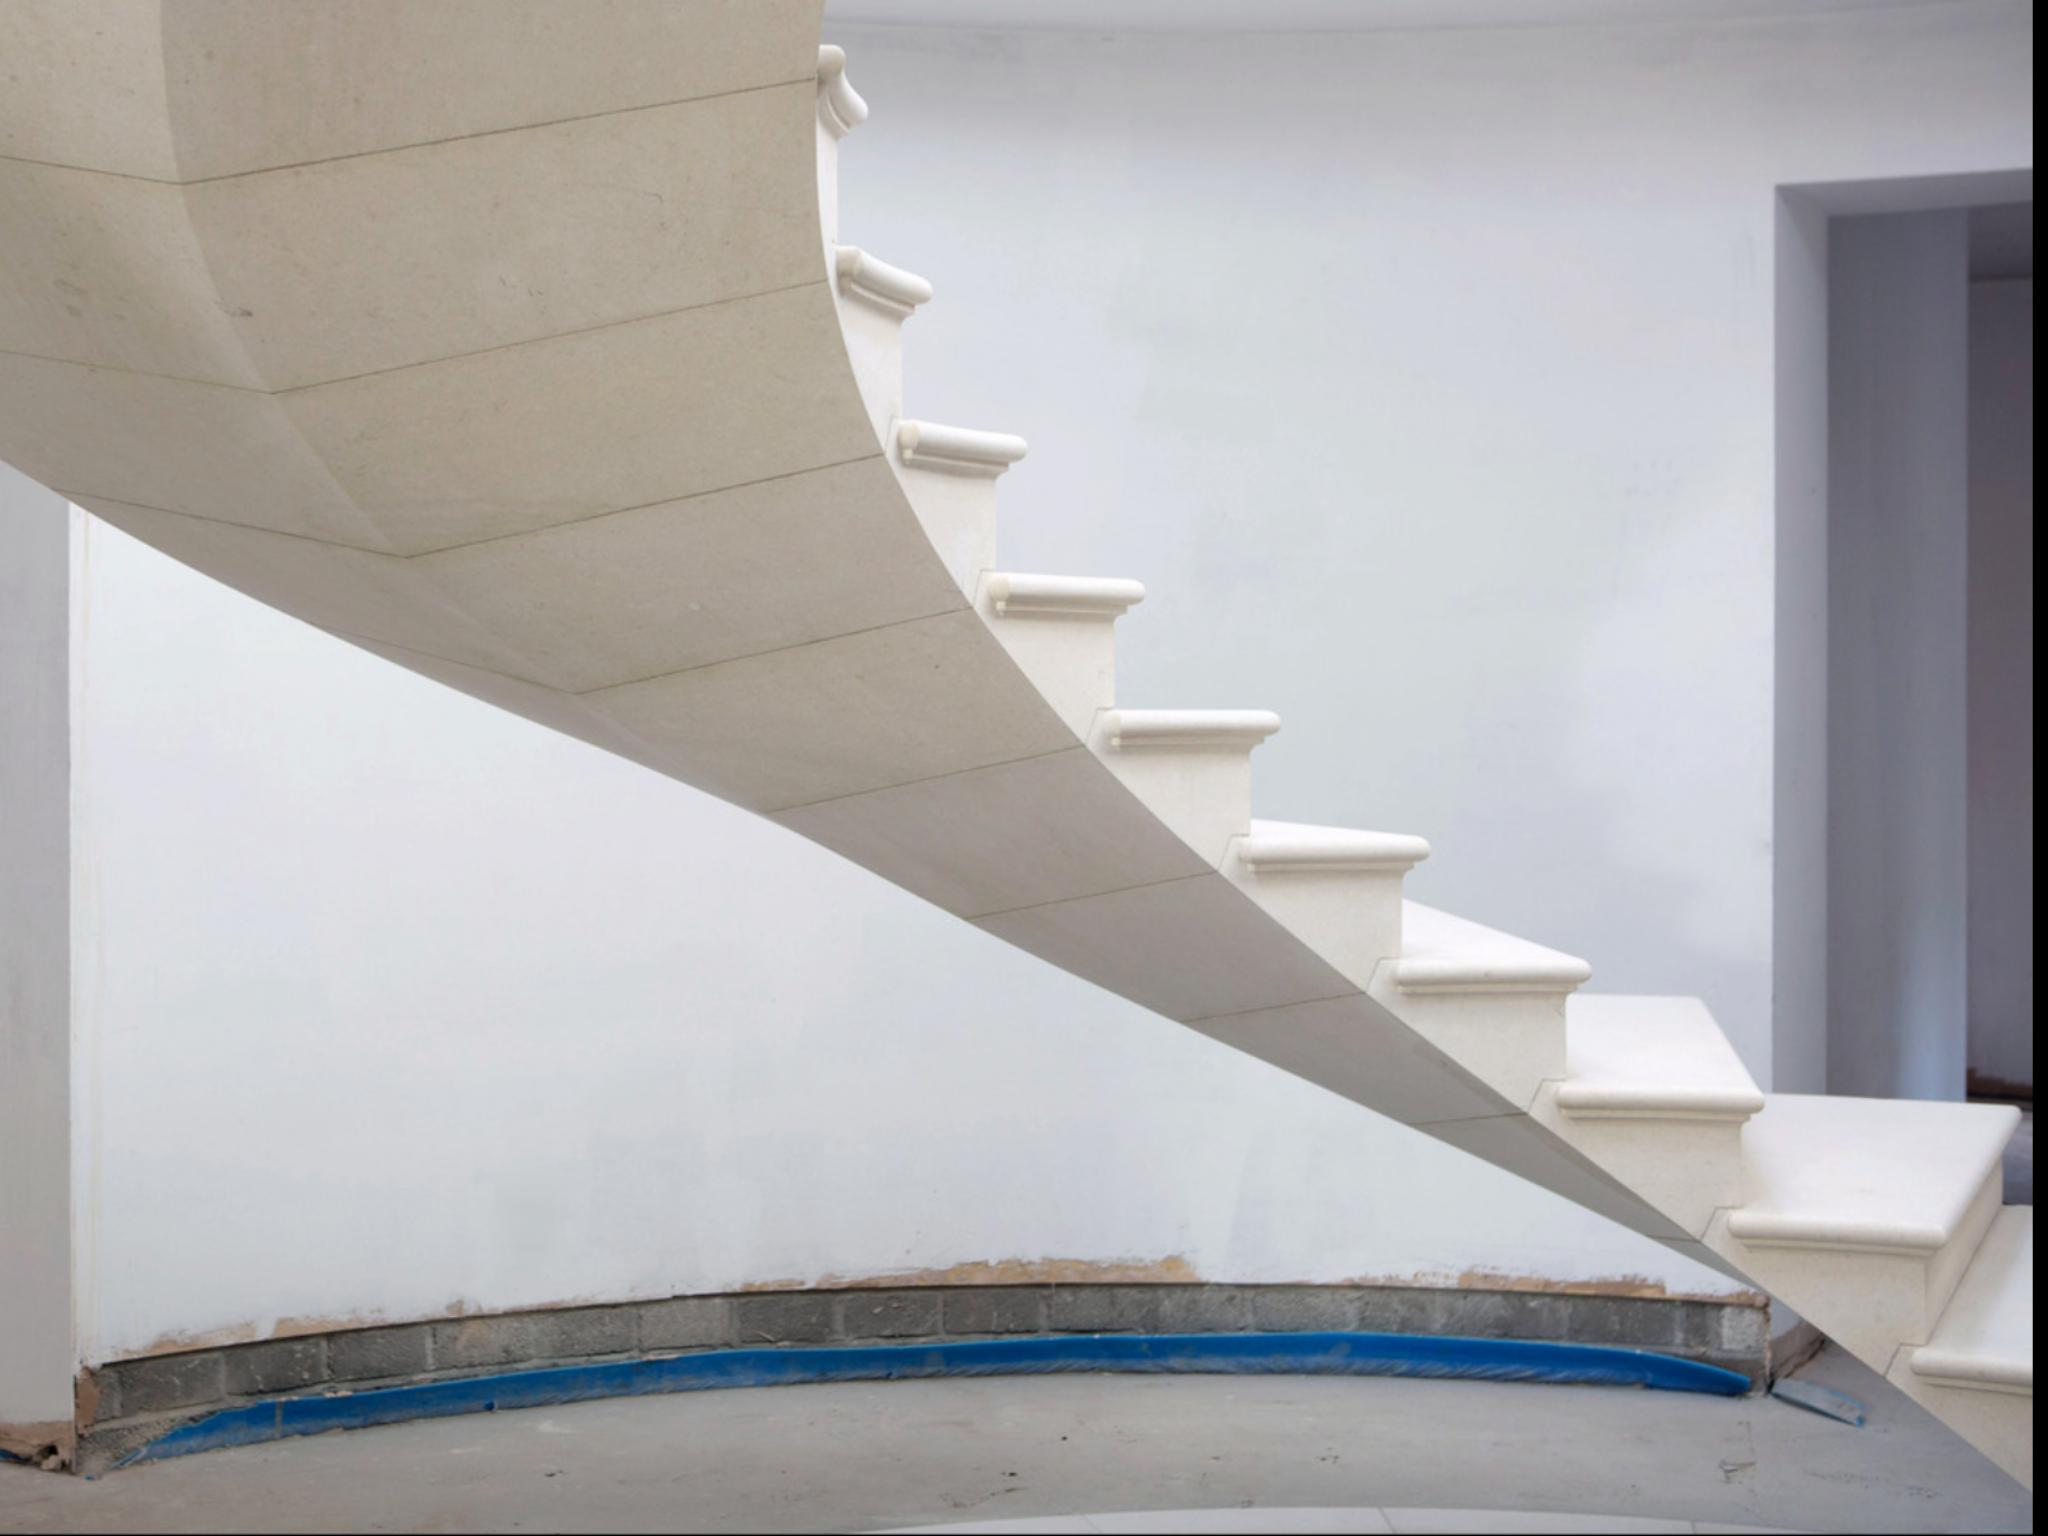 Pin von Itsroro Kusuma auf Staircase | Pinterest